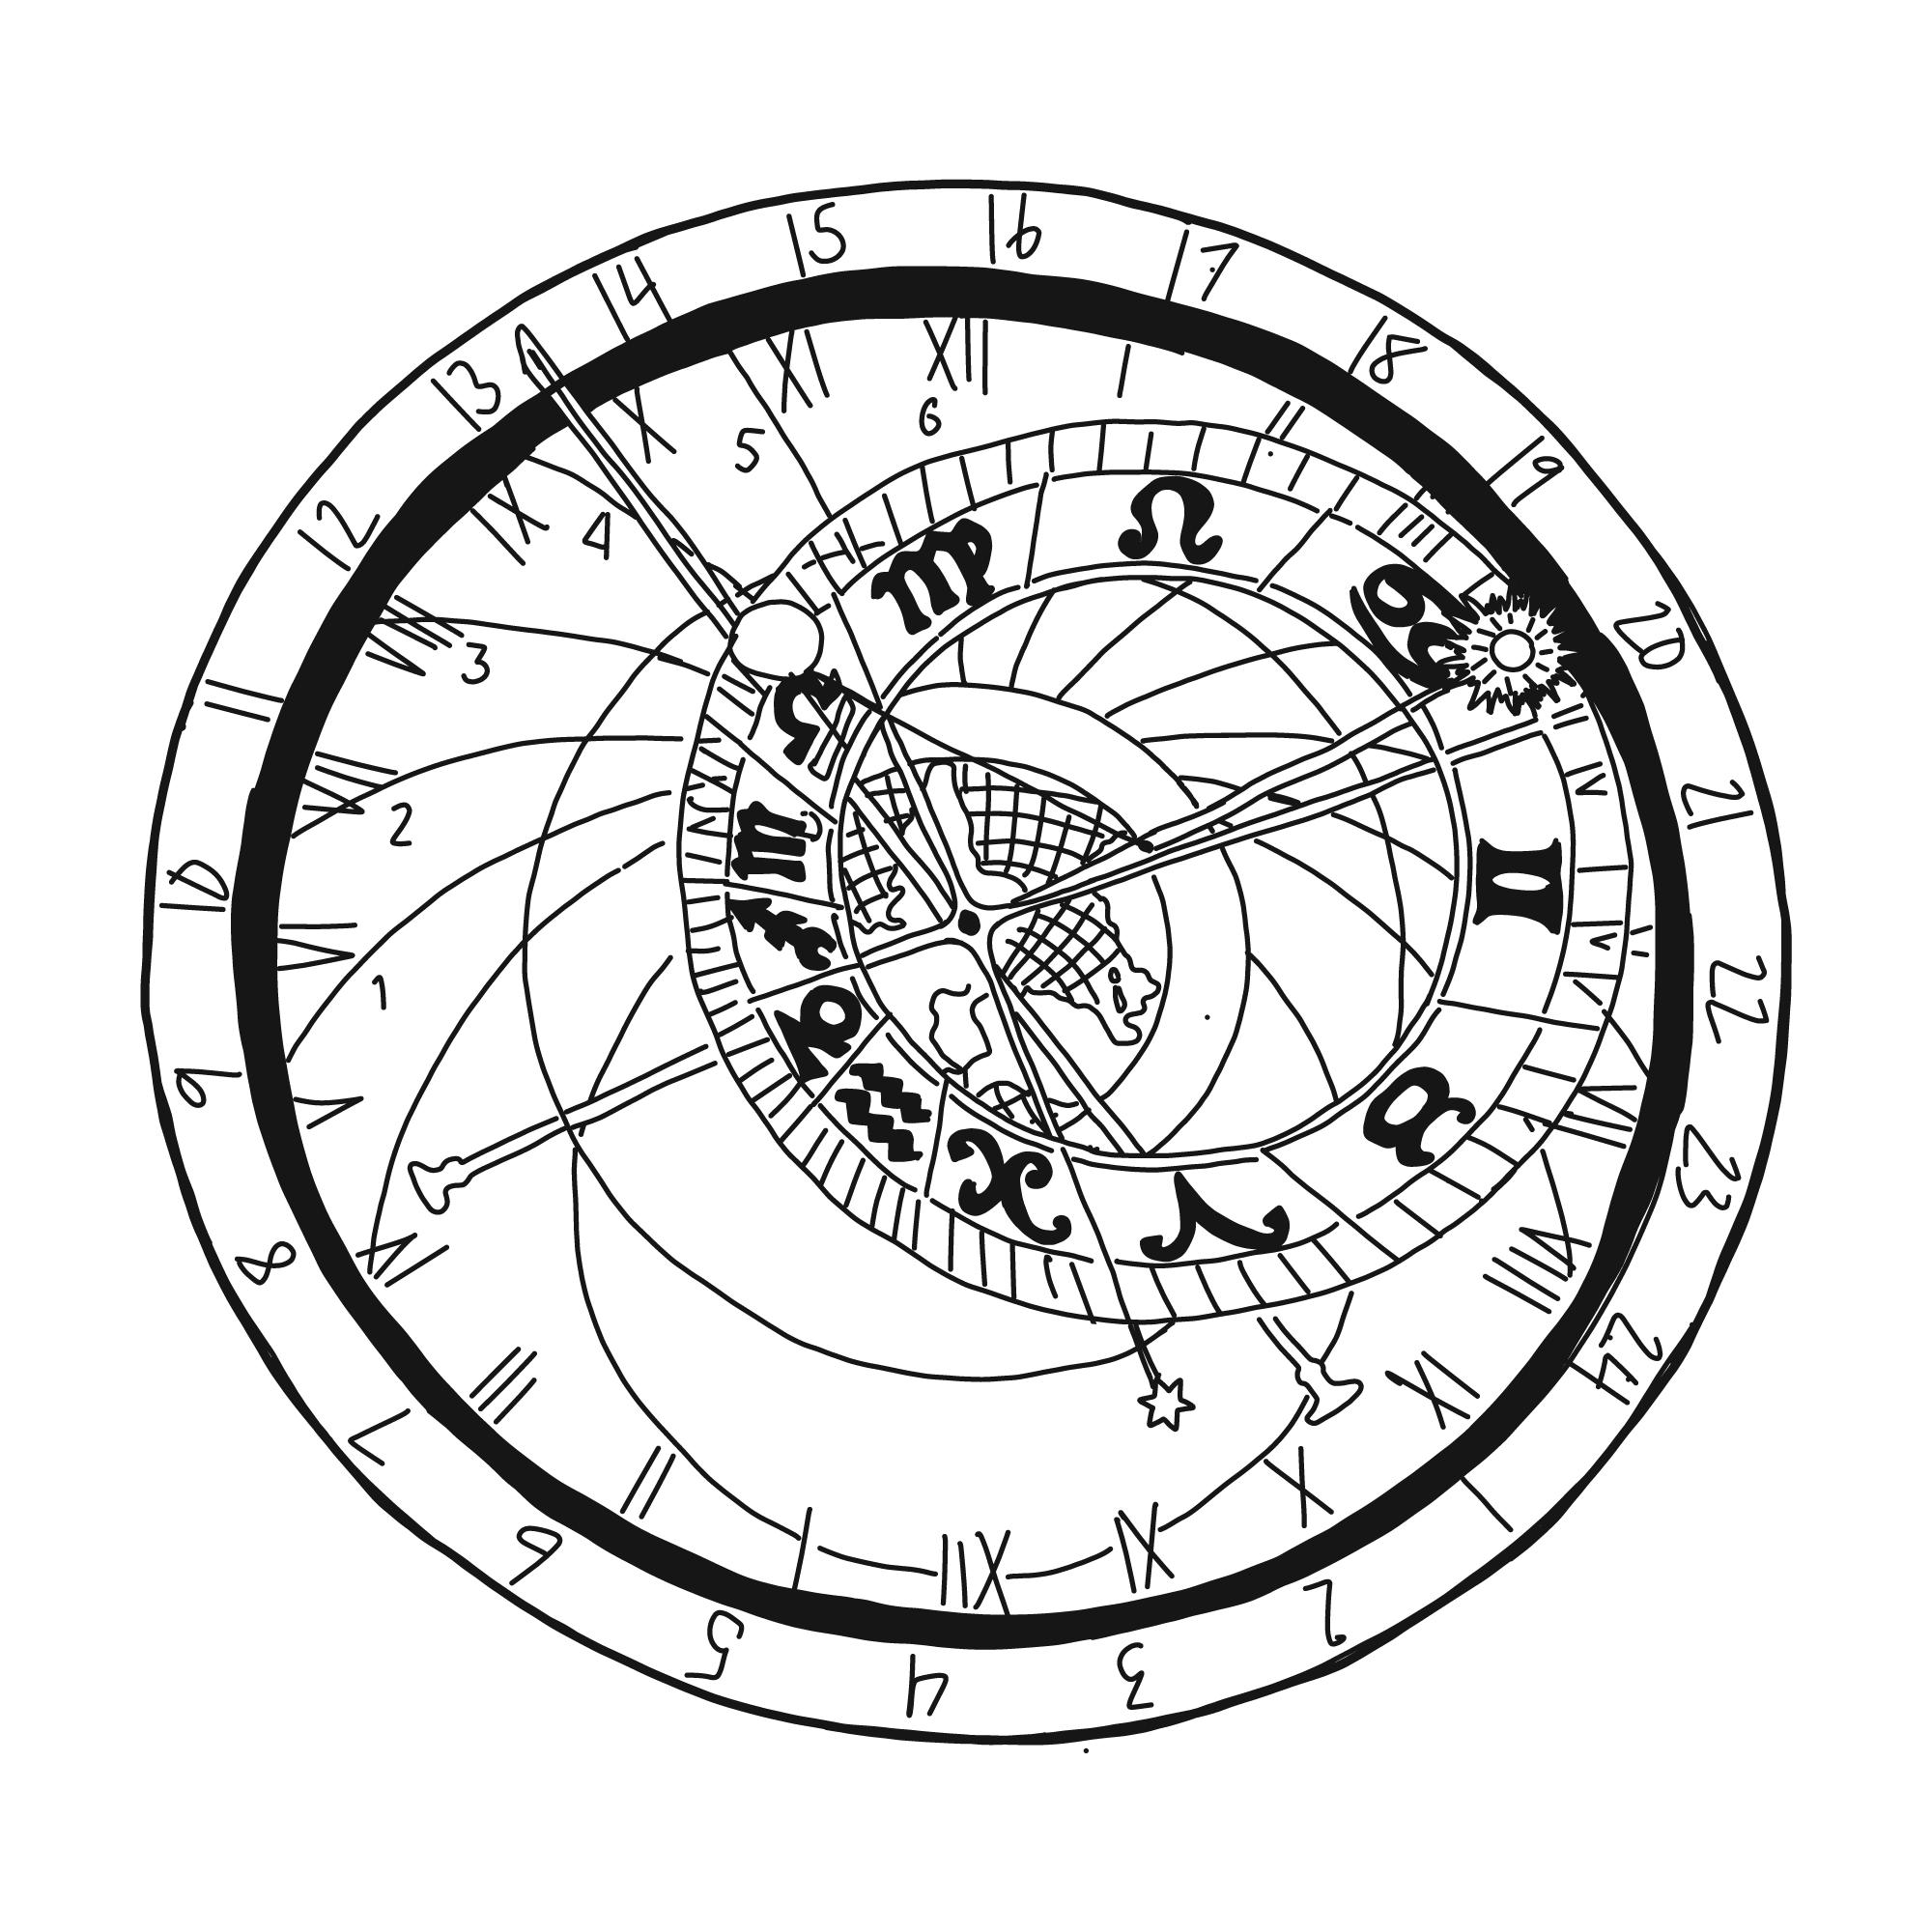 Amphora Water Cosmic Clock hand drawn by Codi Betts